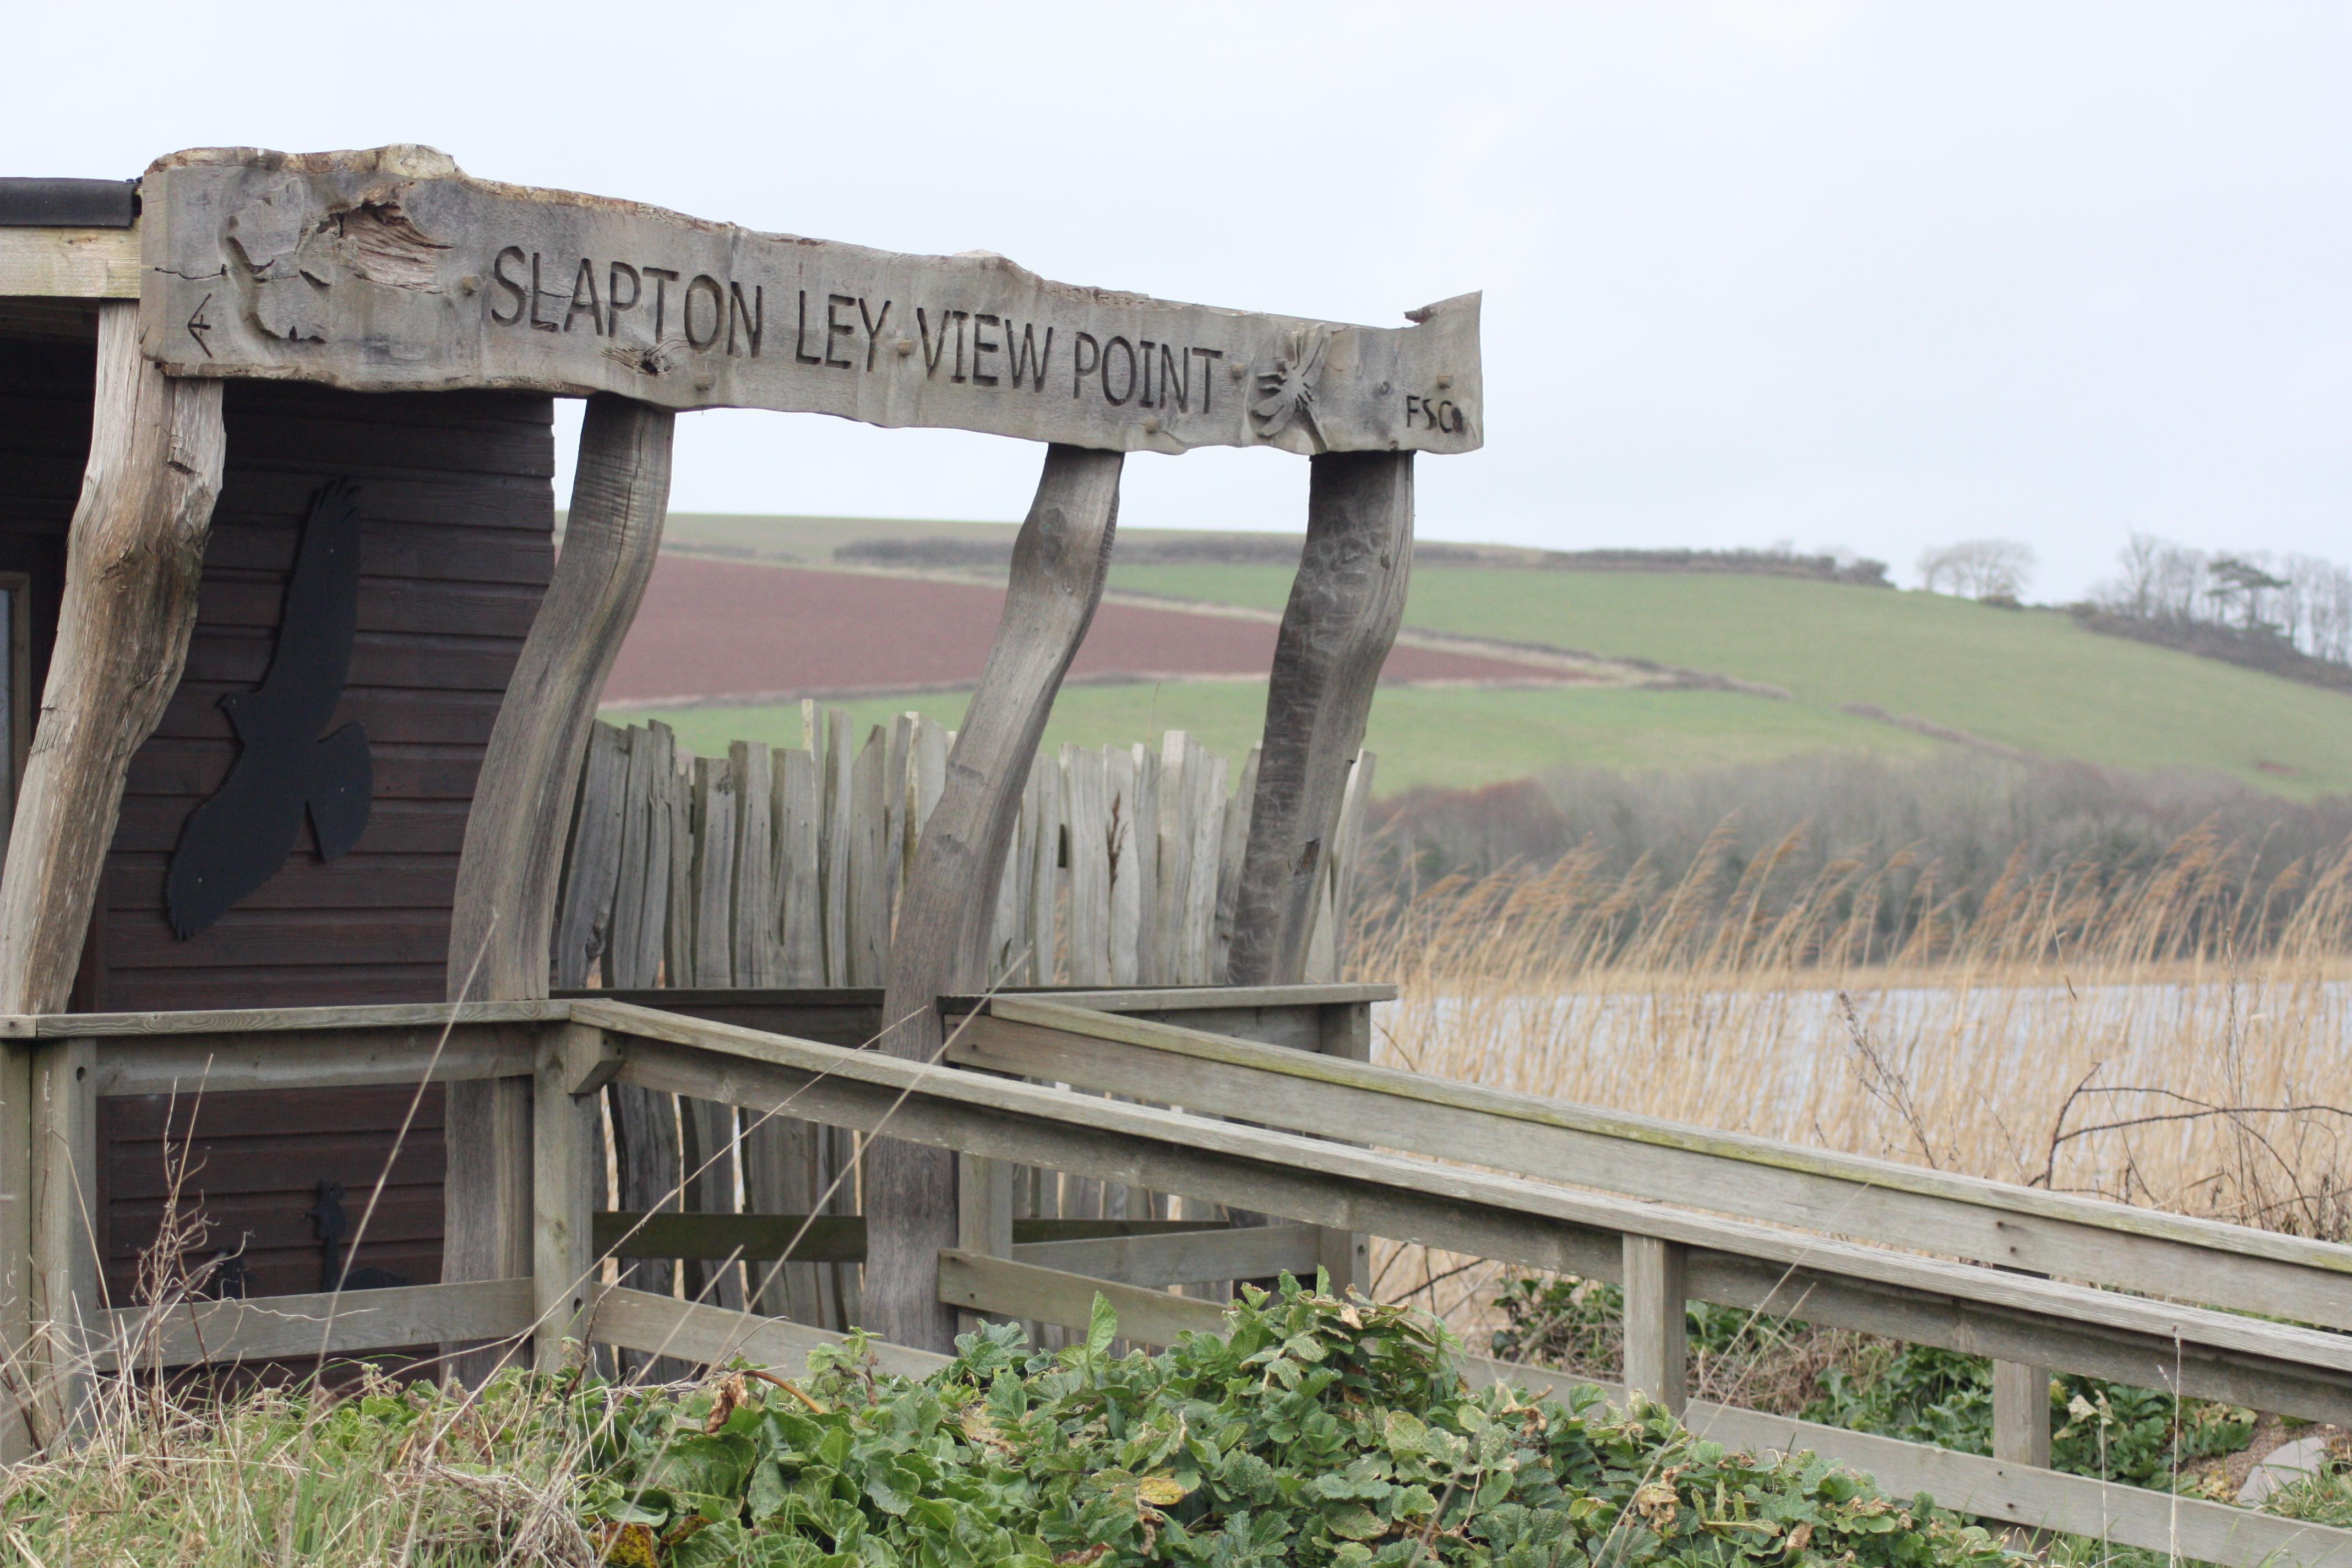 Slapton Ley birdwatching post